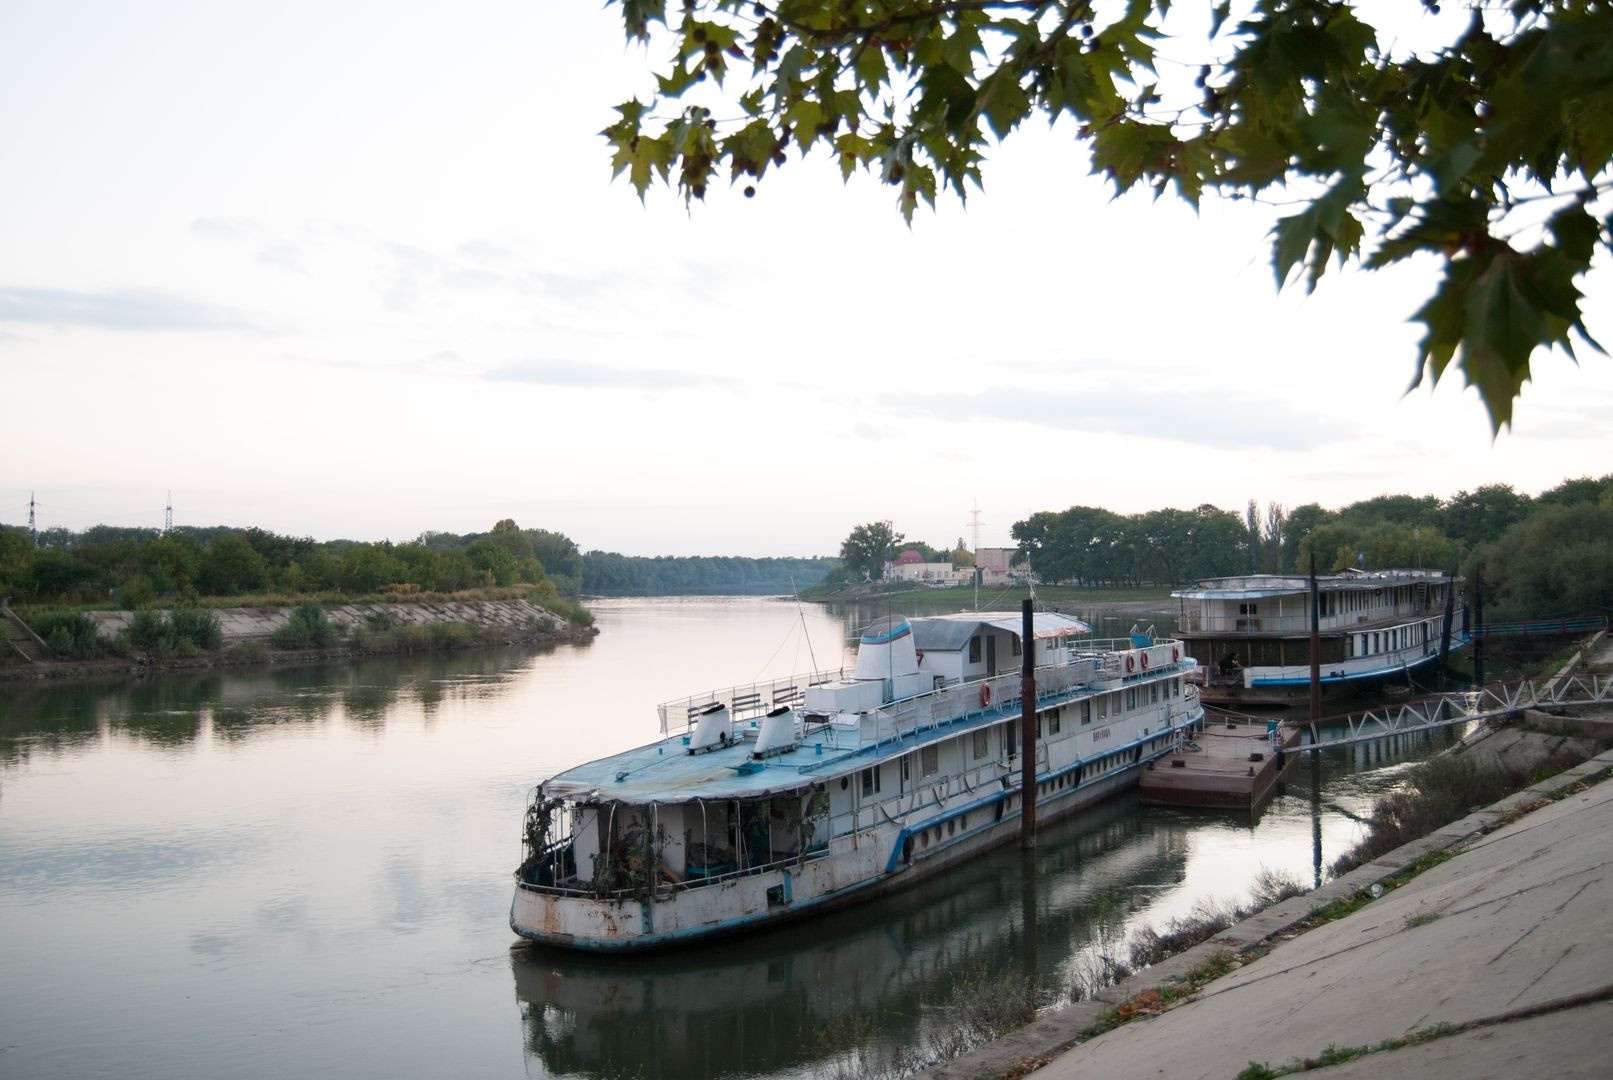 Dniester river embankment